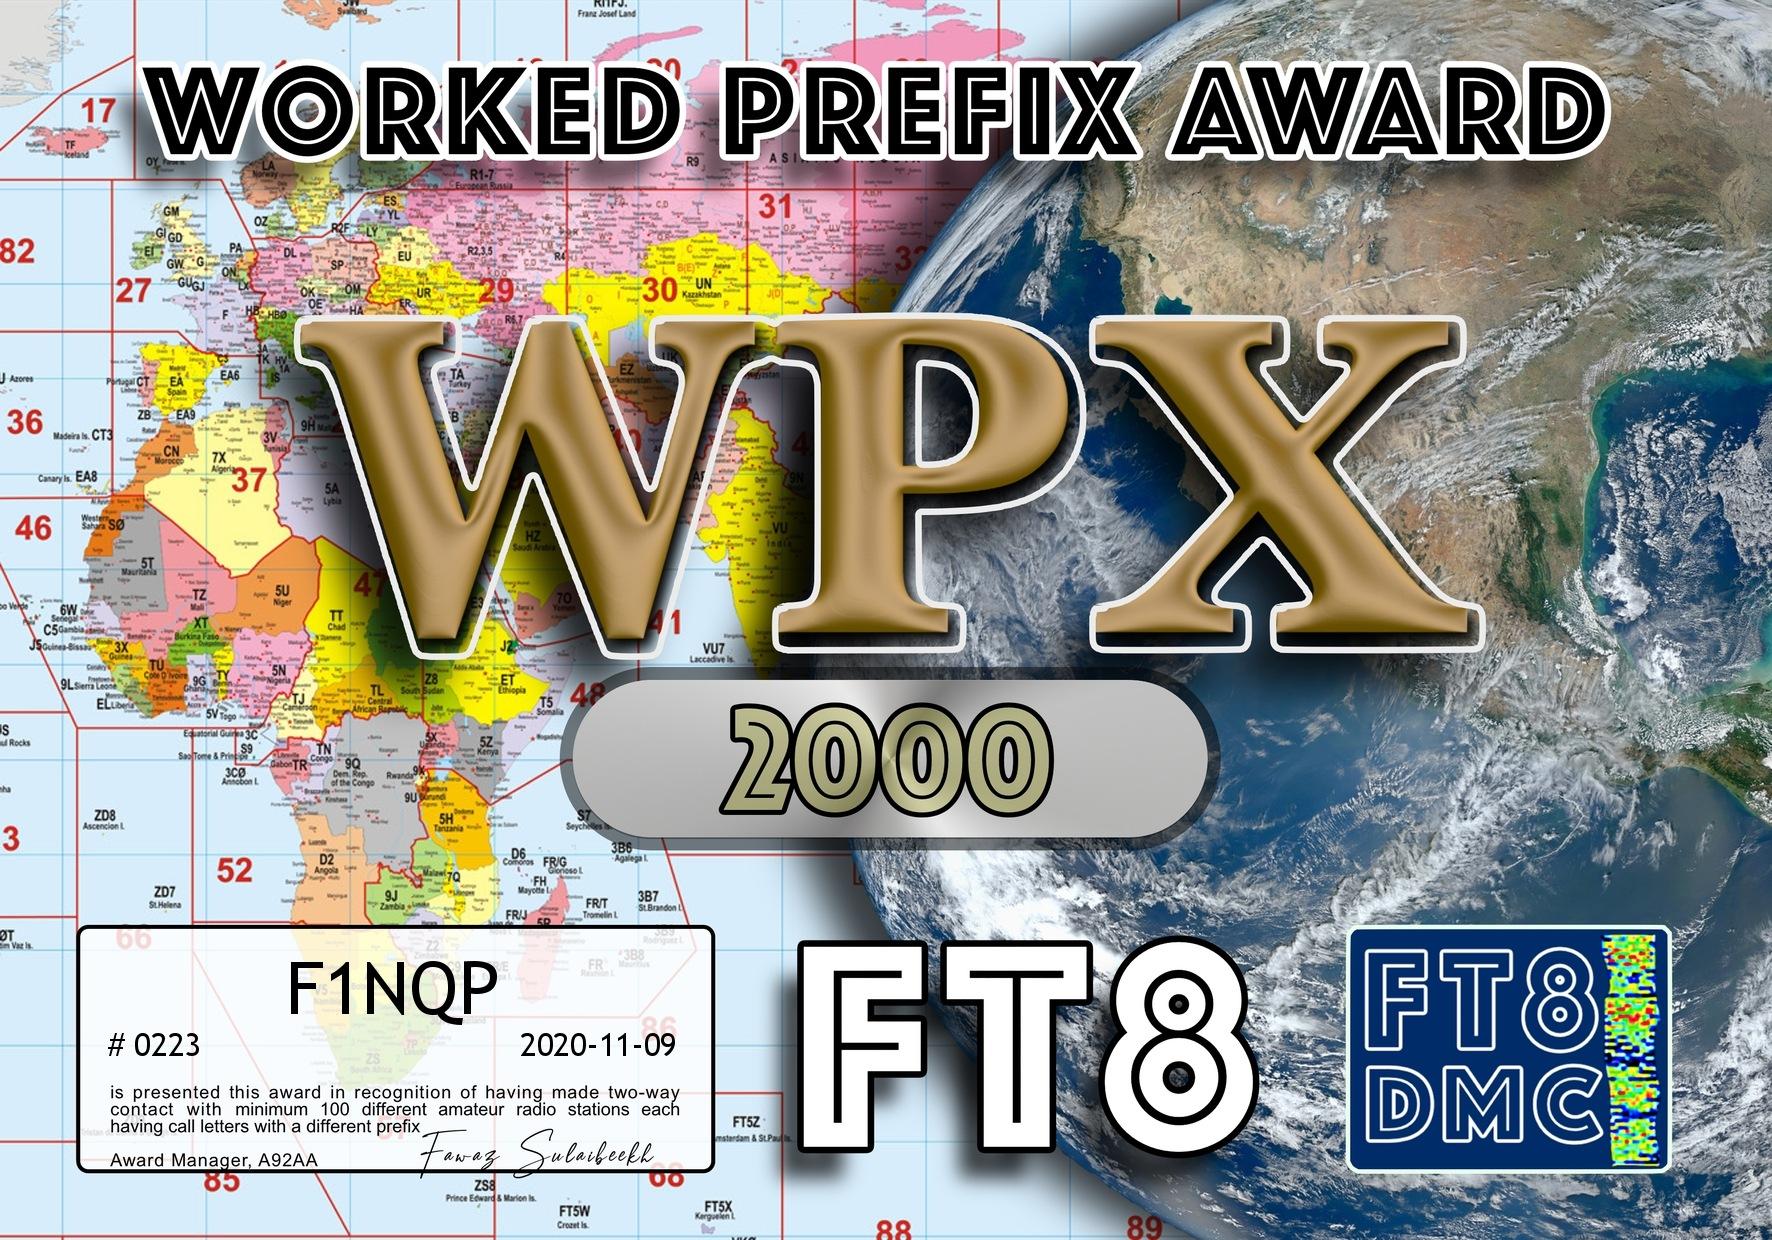 F1NQP-WPX-2000_FT8DMC.jpg